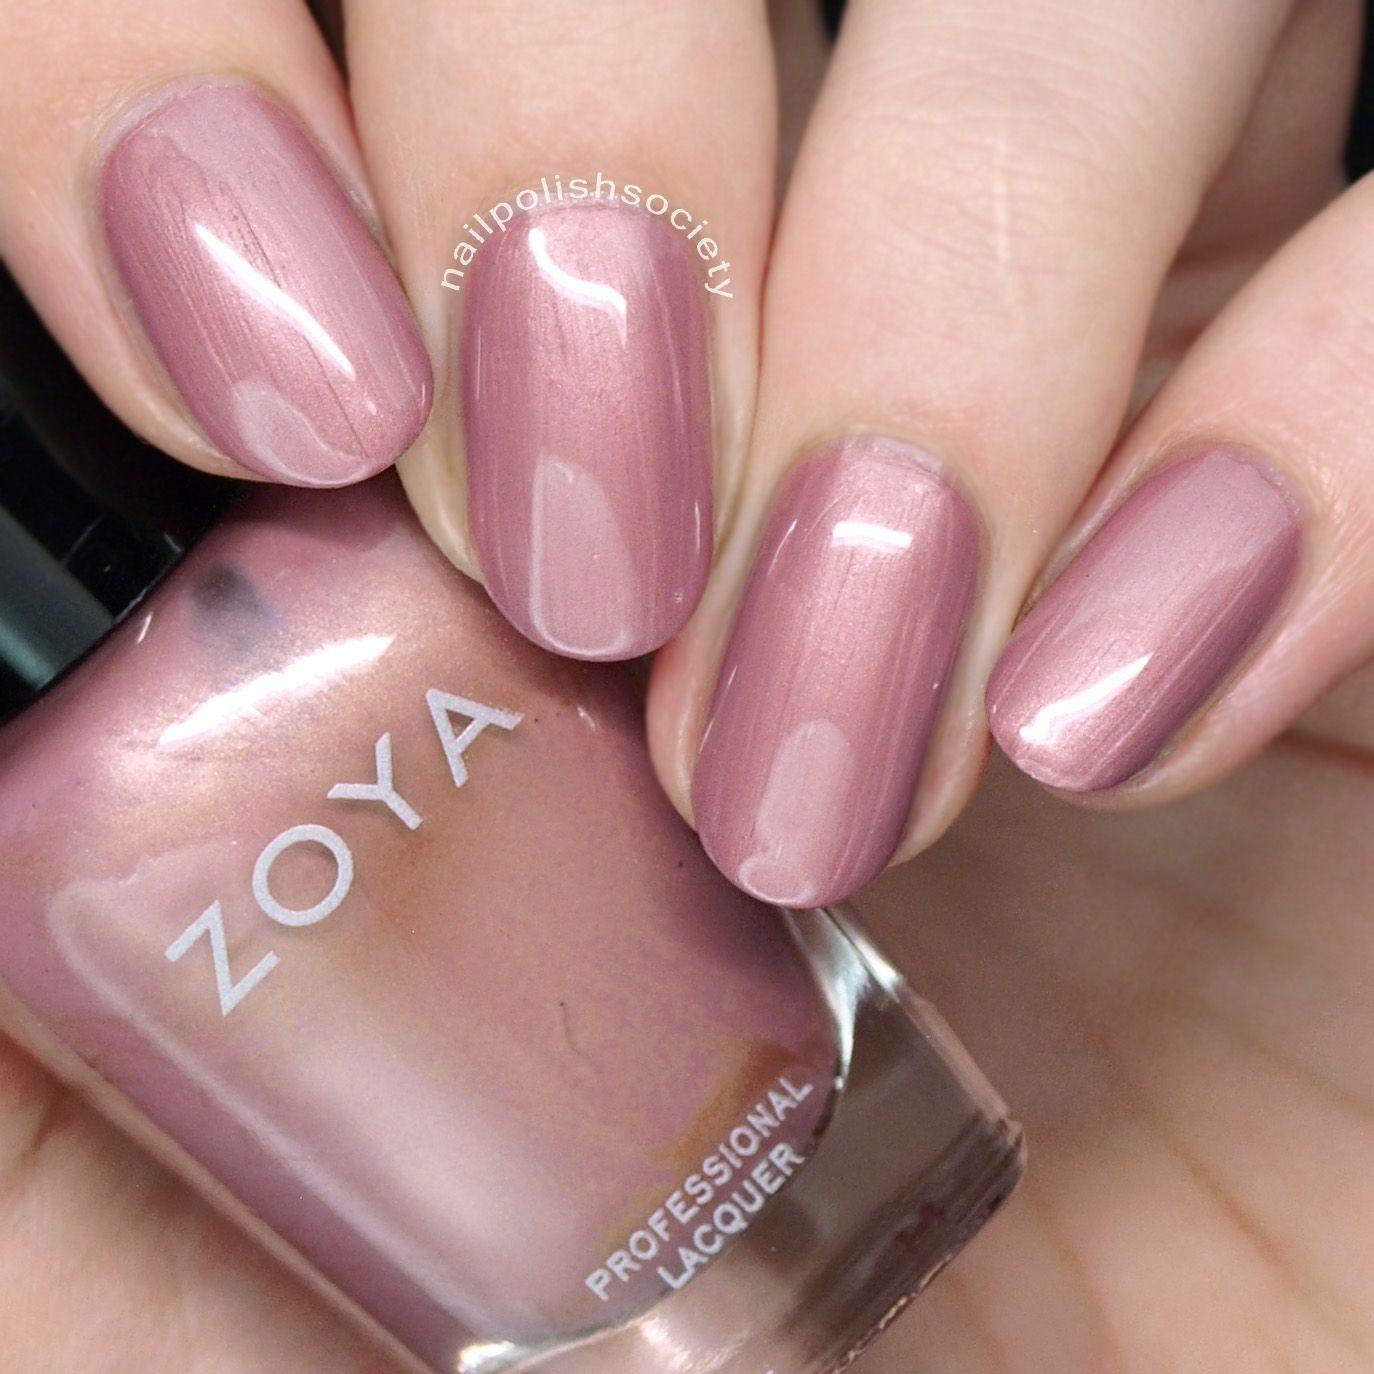 Zoyarumor nail polish in pinterest nails nail polish